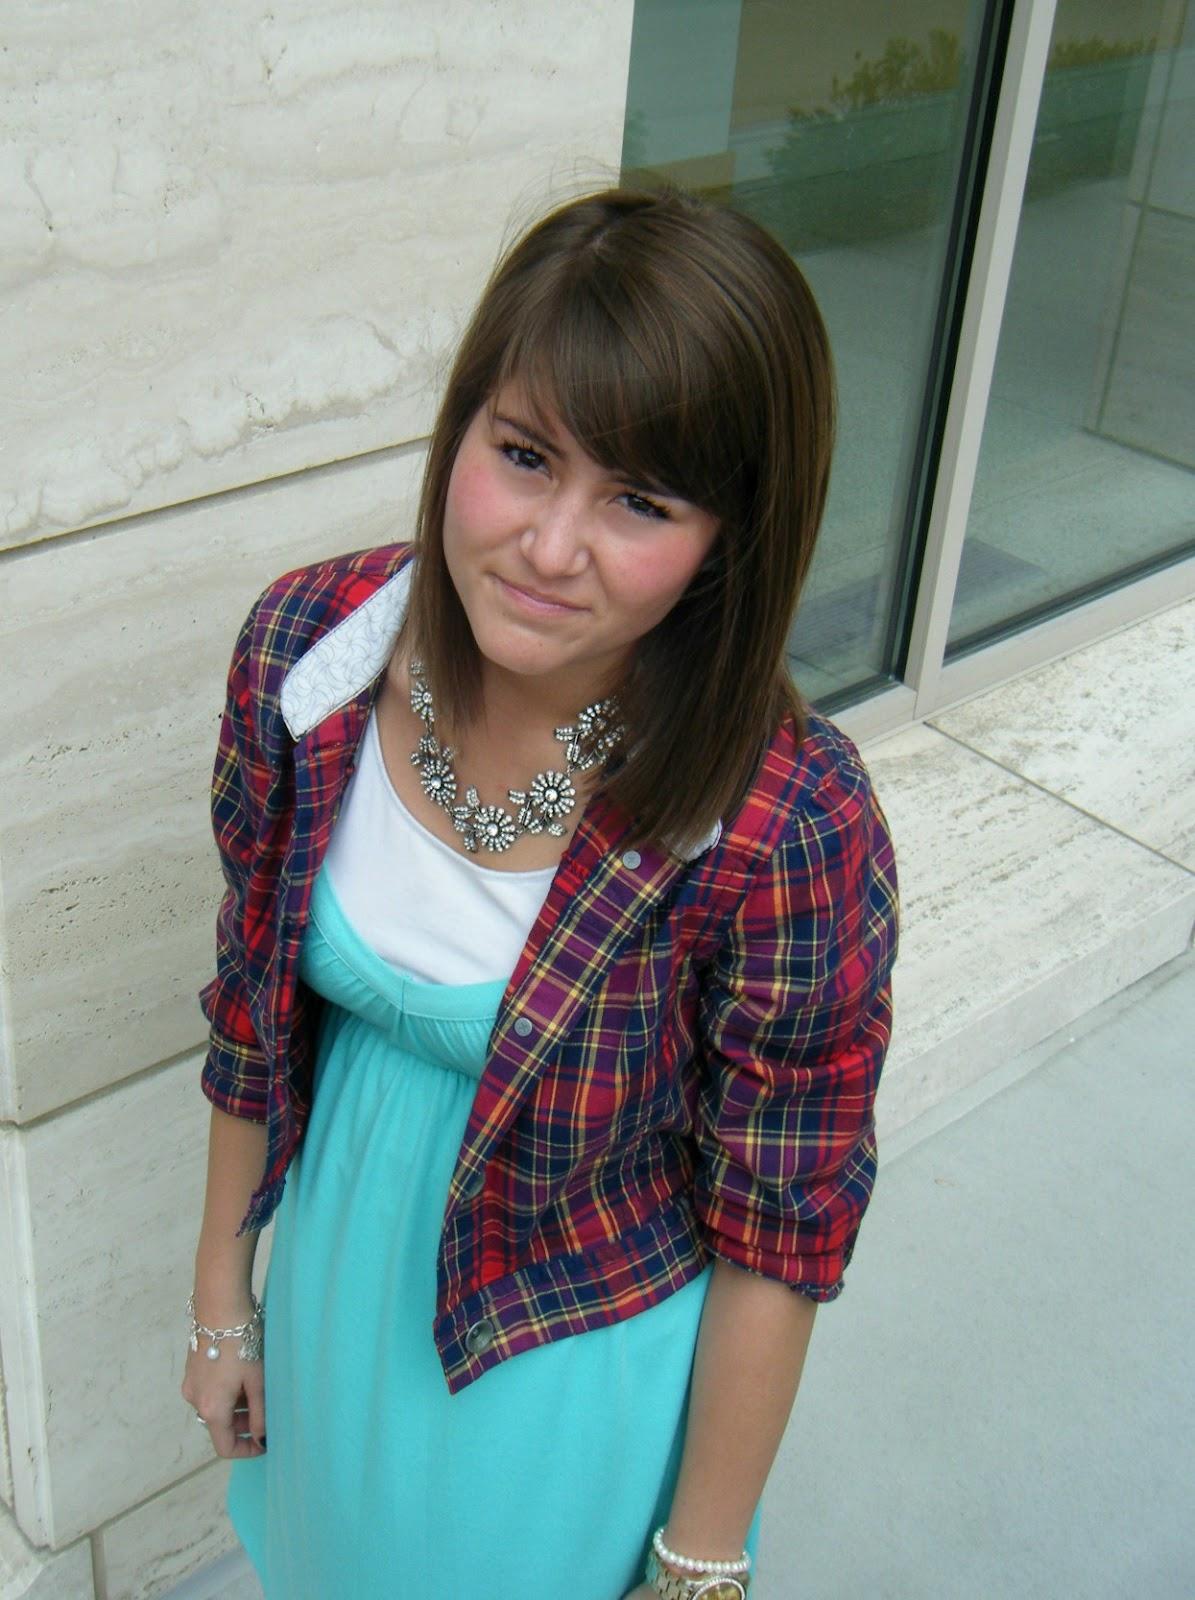 Rachel Sayumi Fashion Lifestyle Blog Outfit R R R Remix